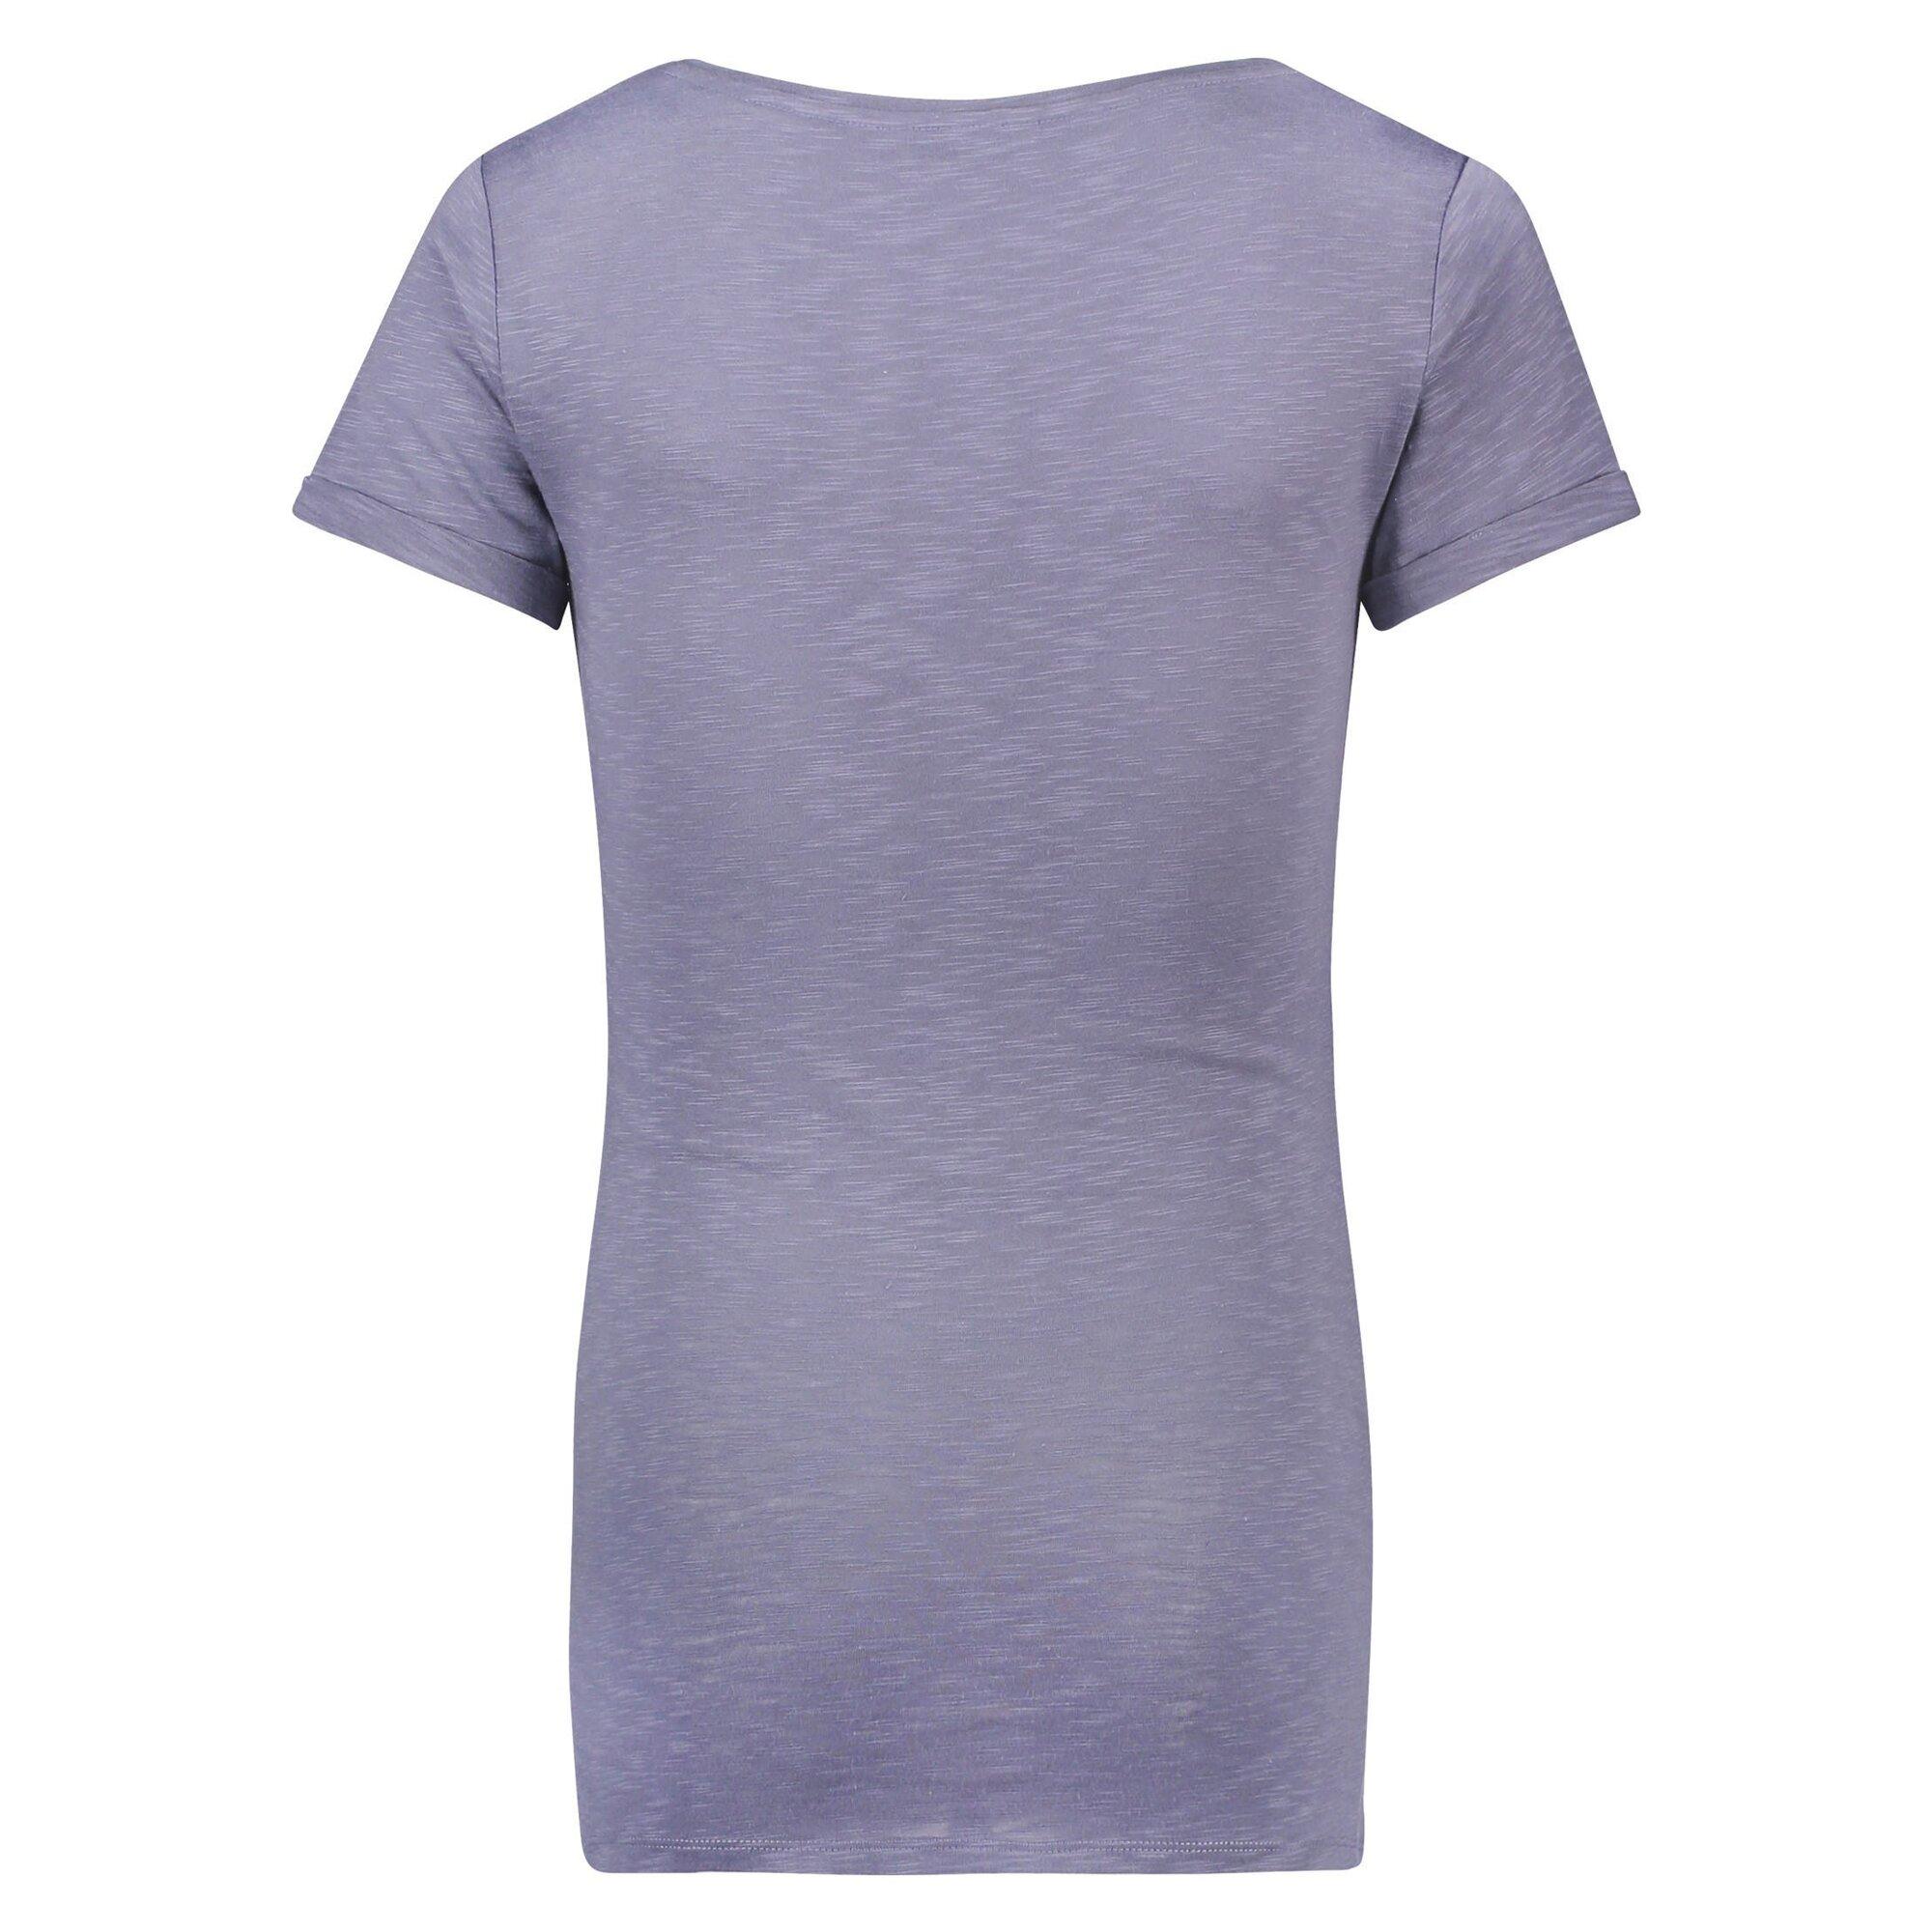 noppies-t-shirt-aukje, 24.99 EUR @ babywalz-de